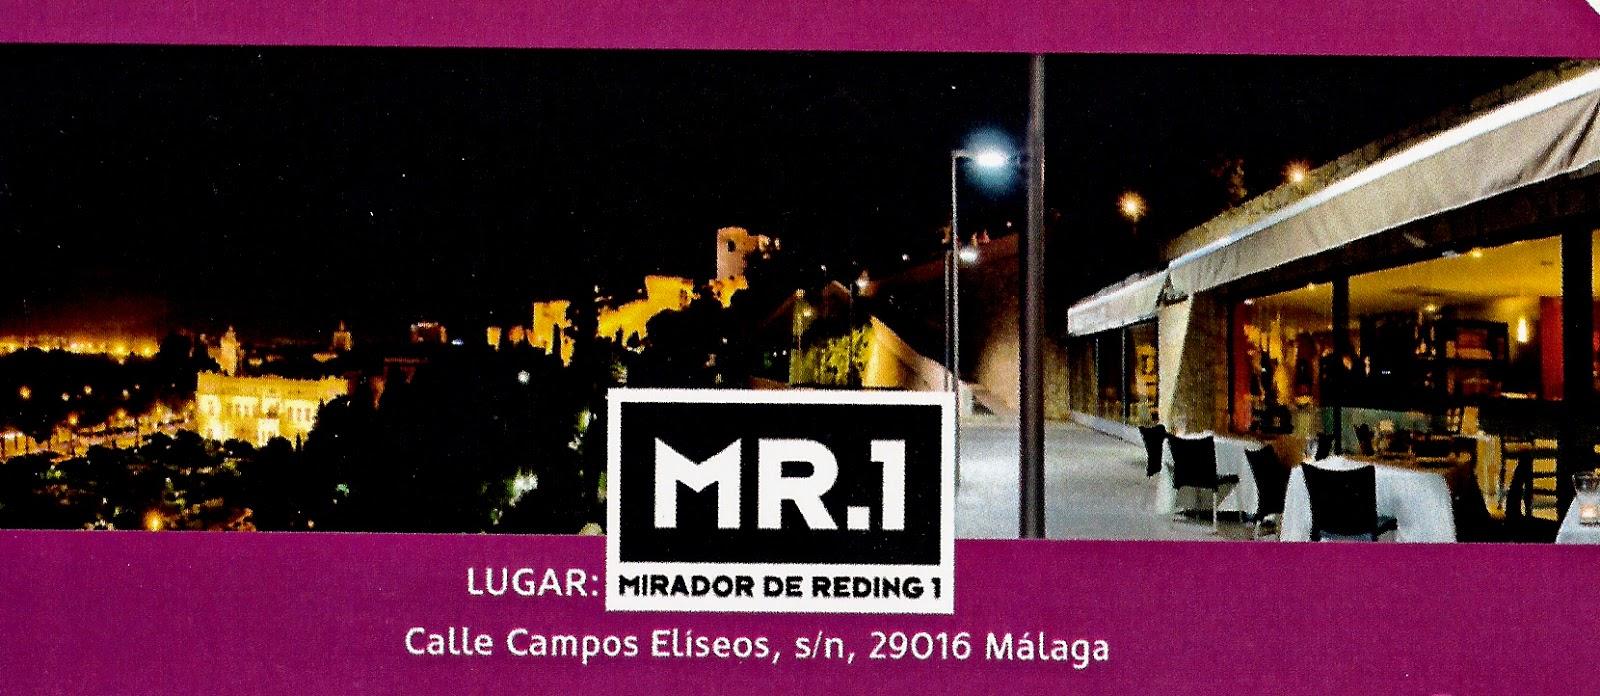 mr1-bares-malaga